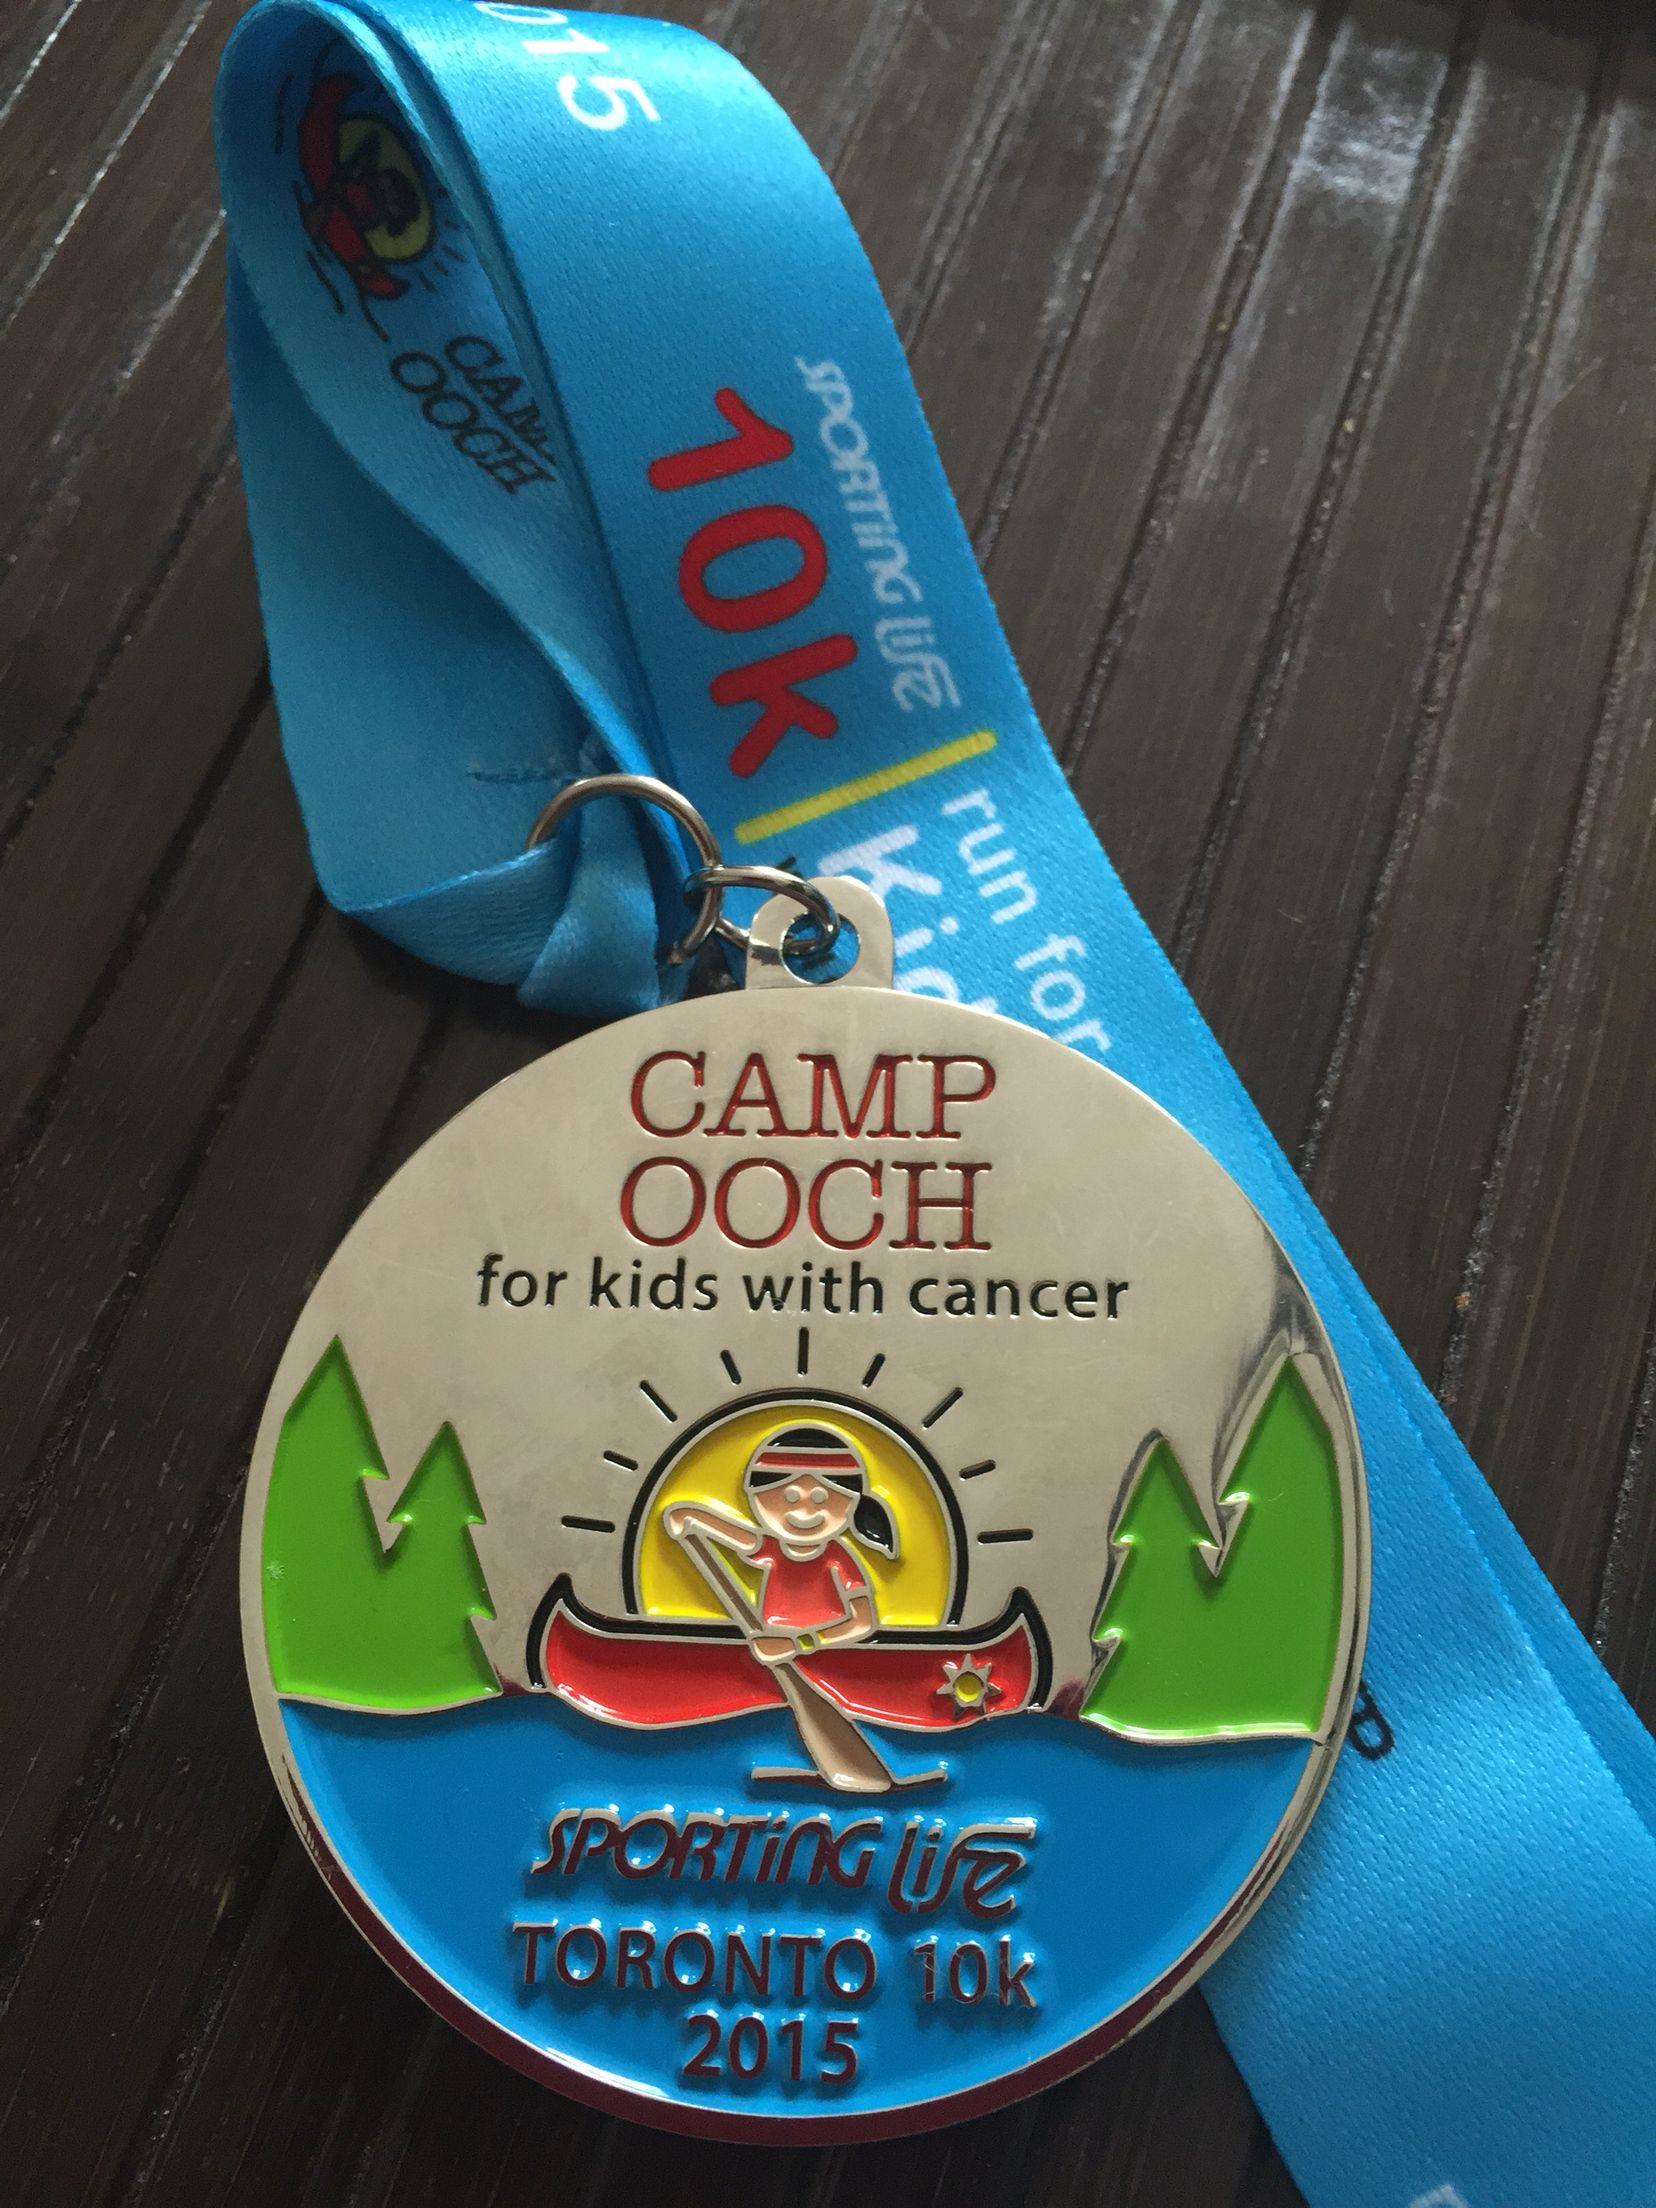 Sporting Life 10K 2015   Race medal, Running 10k, Sports